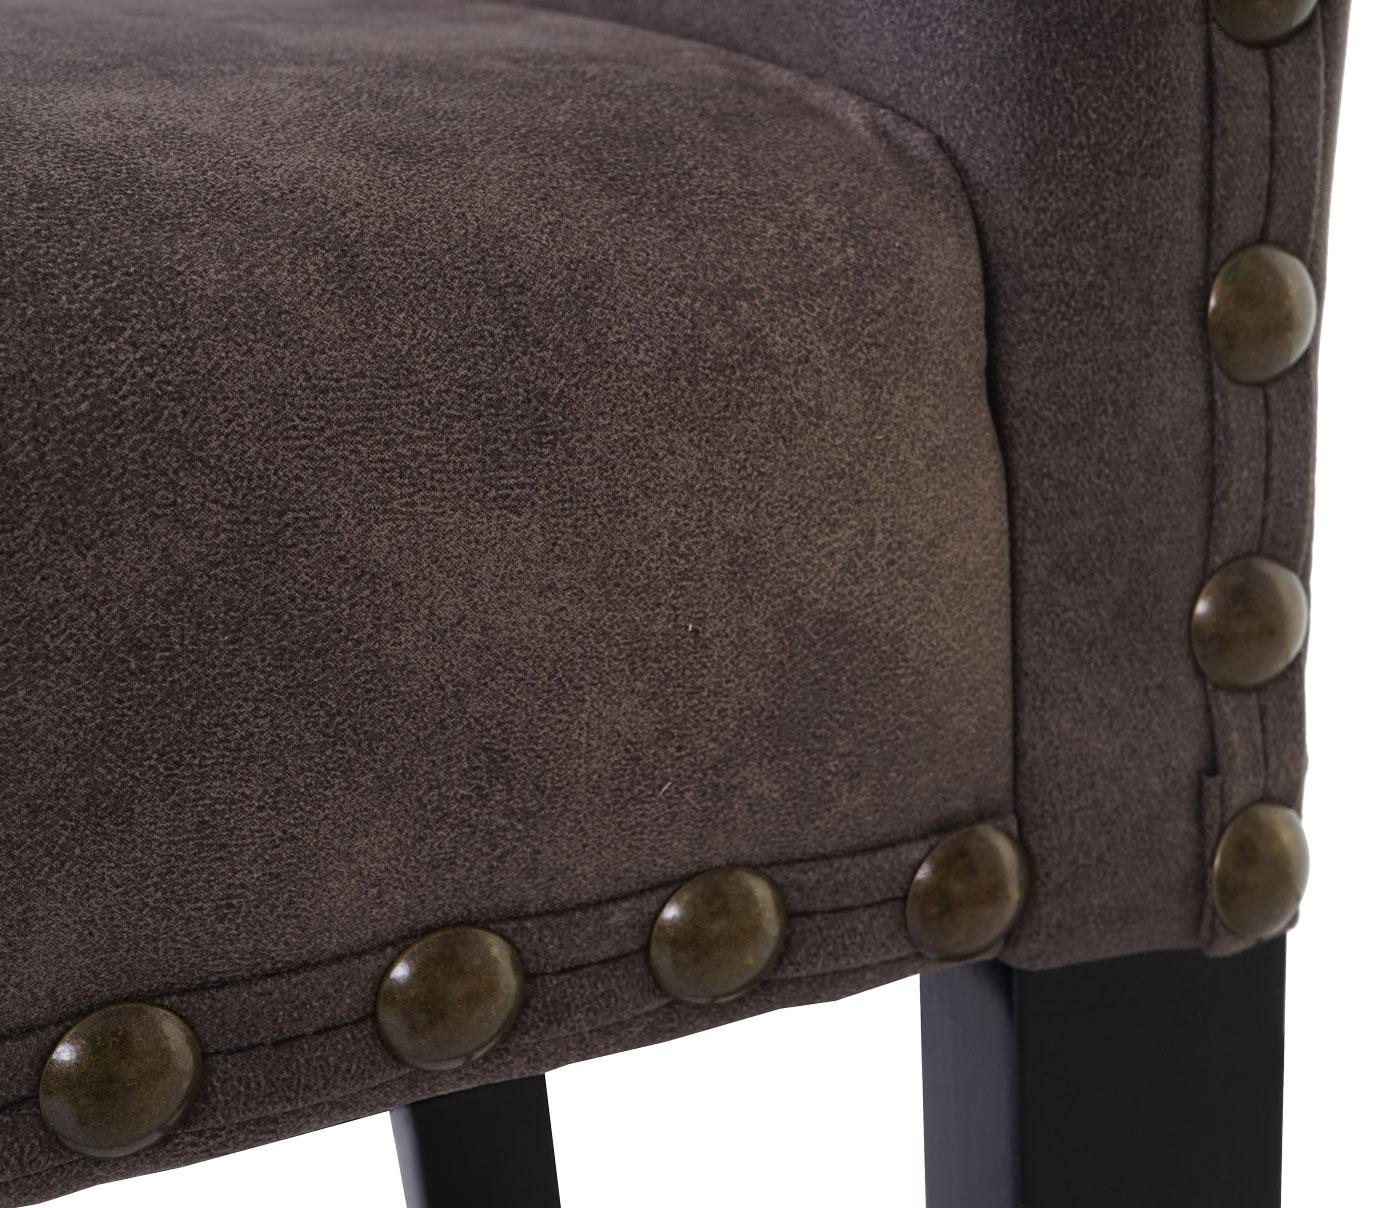 2x tresenhocker mcw a93 barhocker chesterfield textil for Barhocker chesterfield